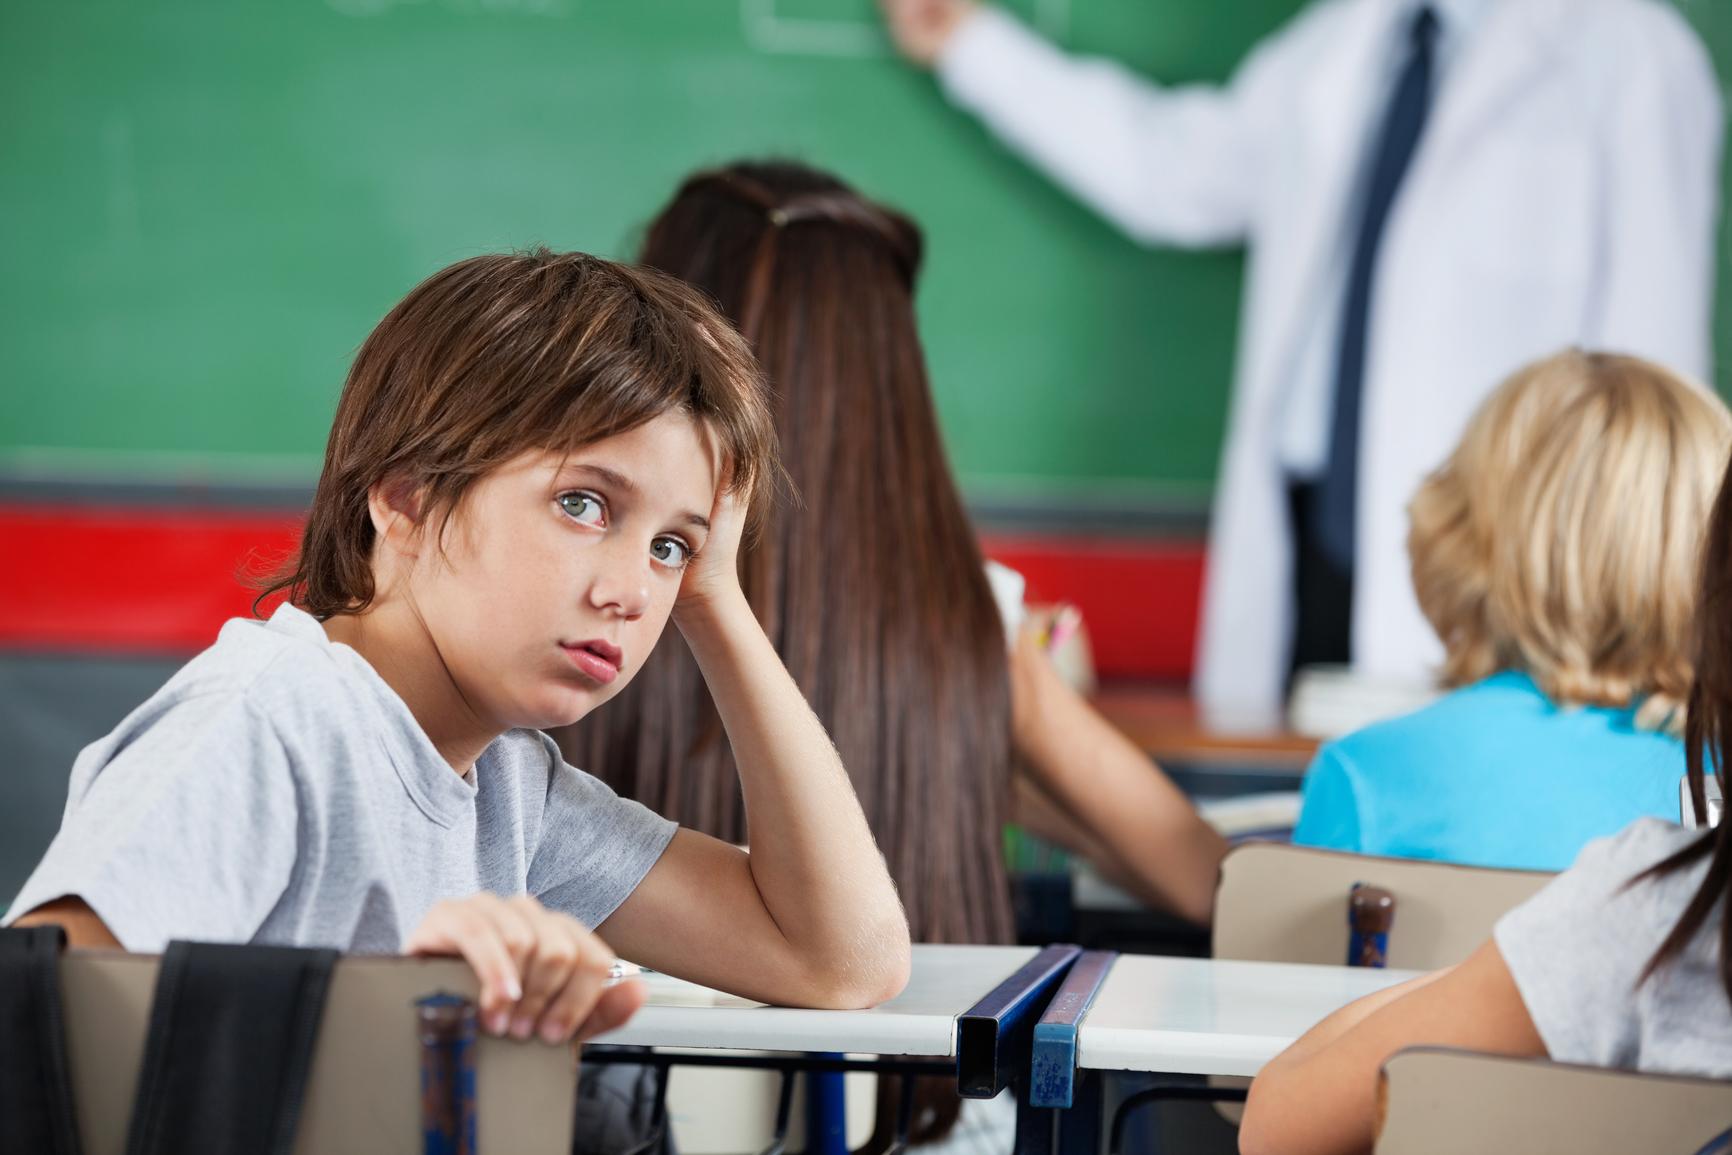 Portrait Of Little Boy Leaning At Desk